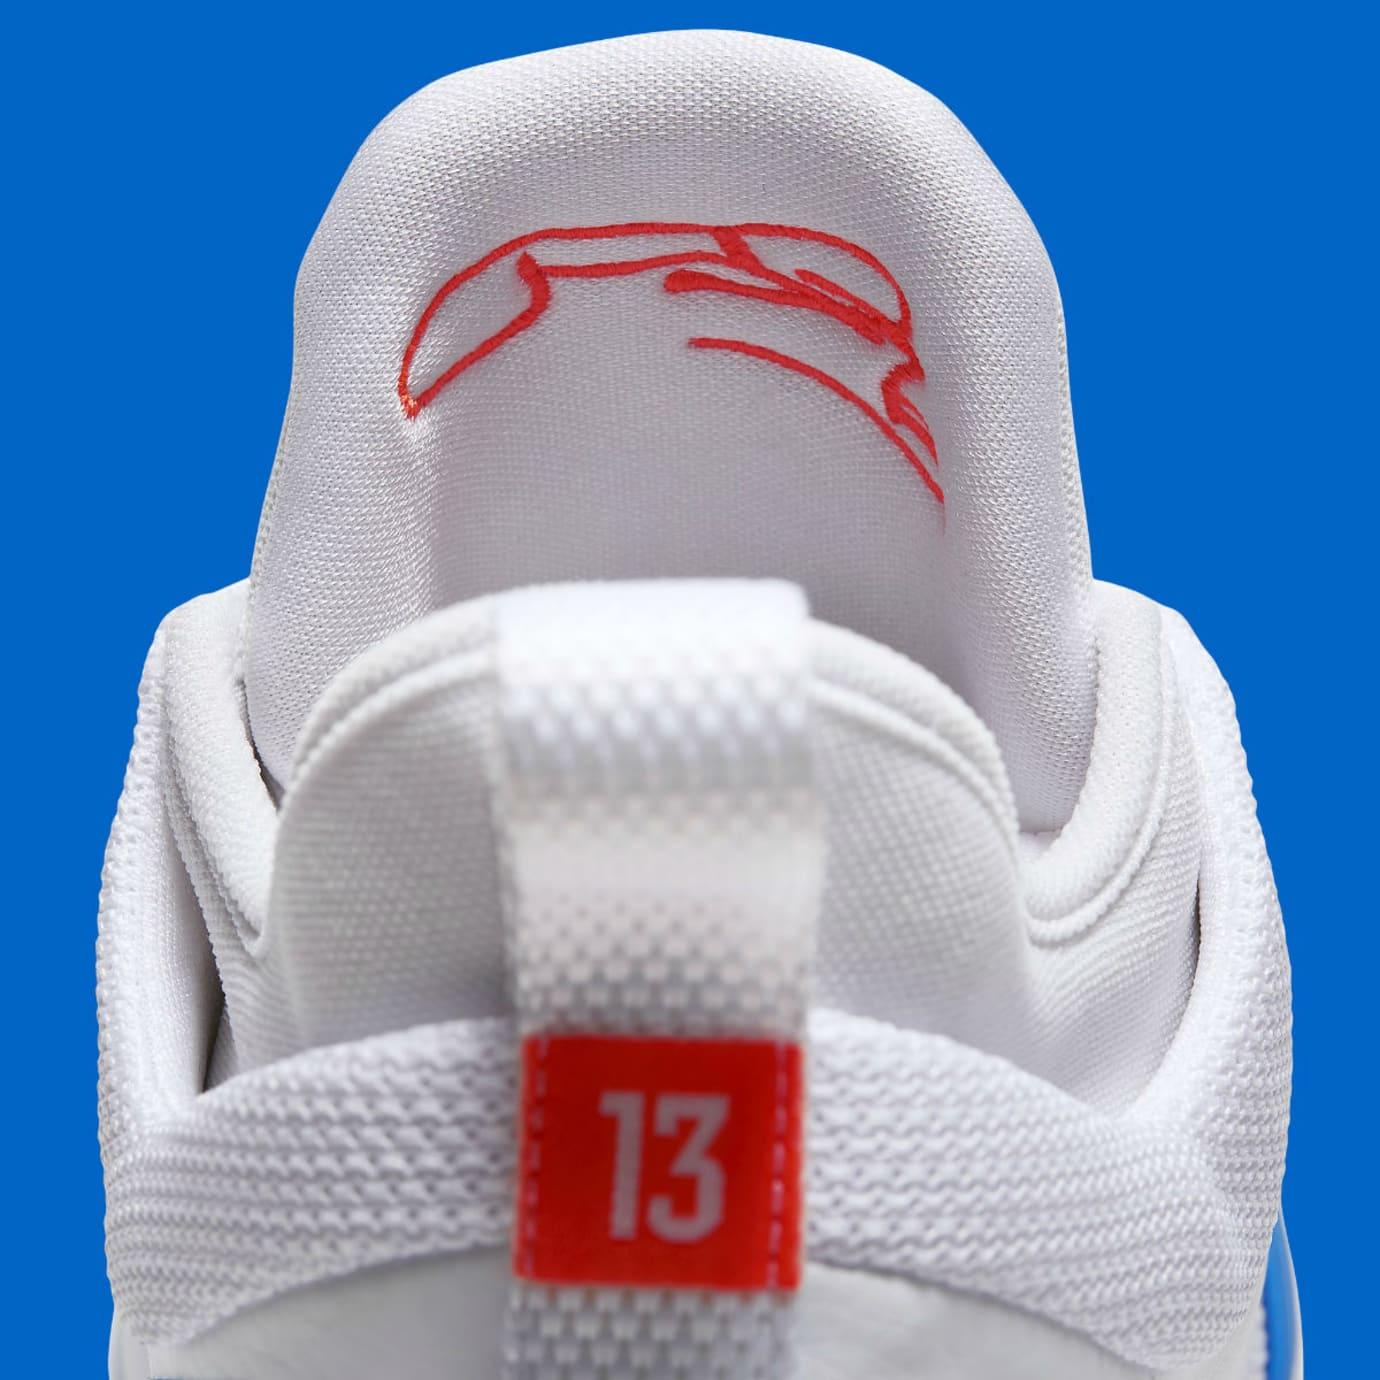 f16393c8e12 Nike PG2 OKC Home Release Date AJ2039-100 Tongue